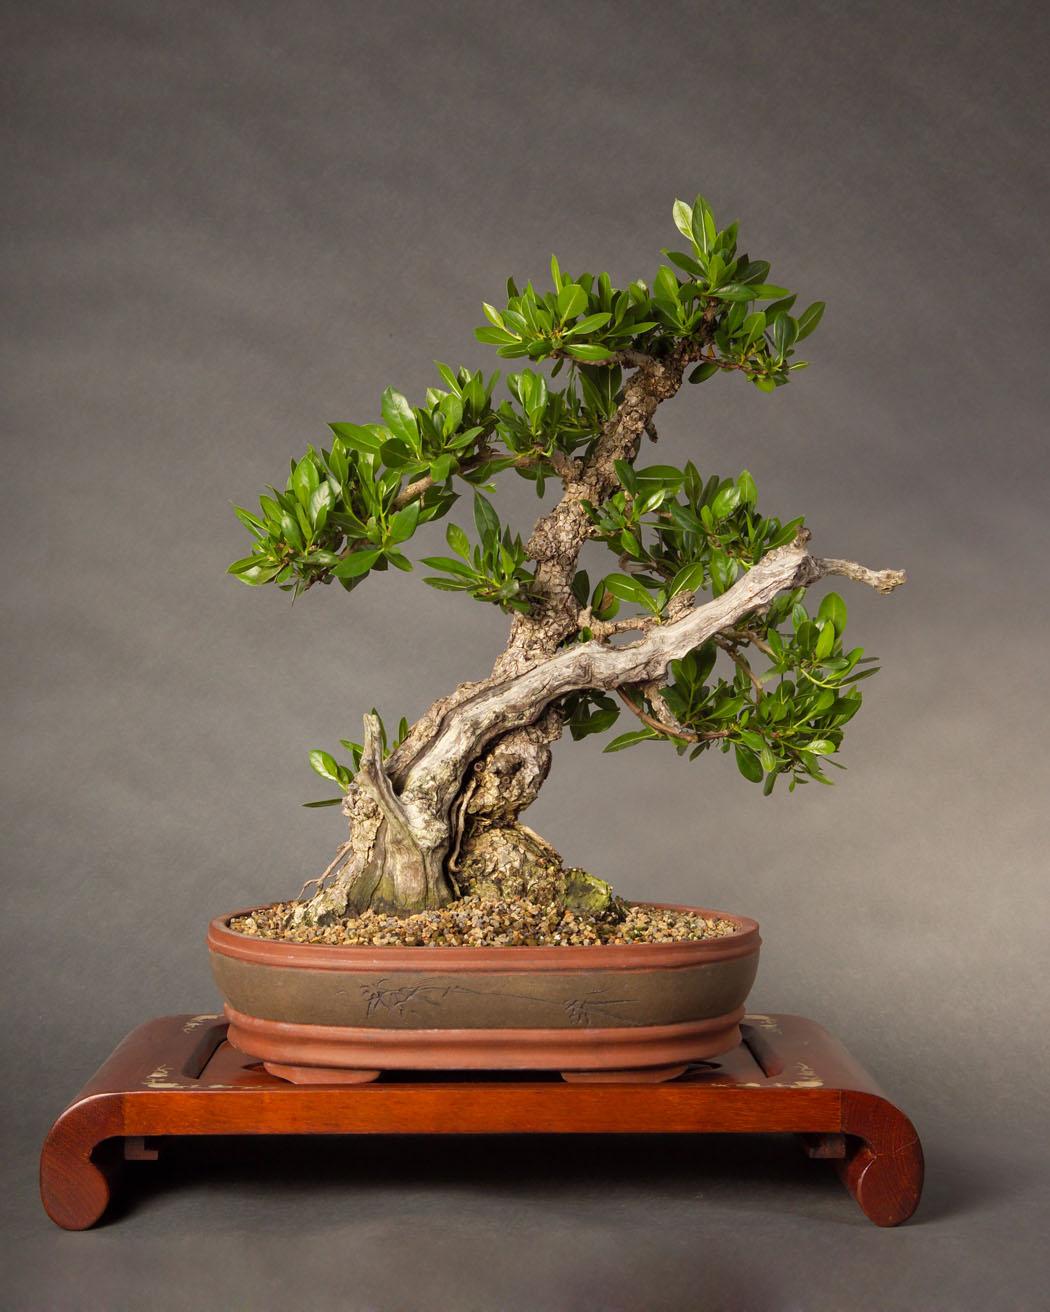 Bonsai Tree For Sale Houston Bonsai Tree